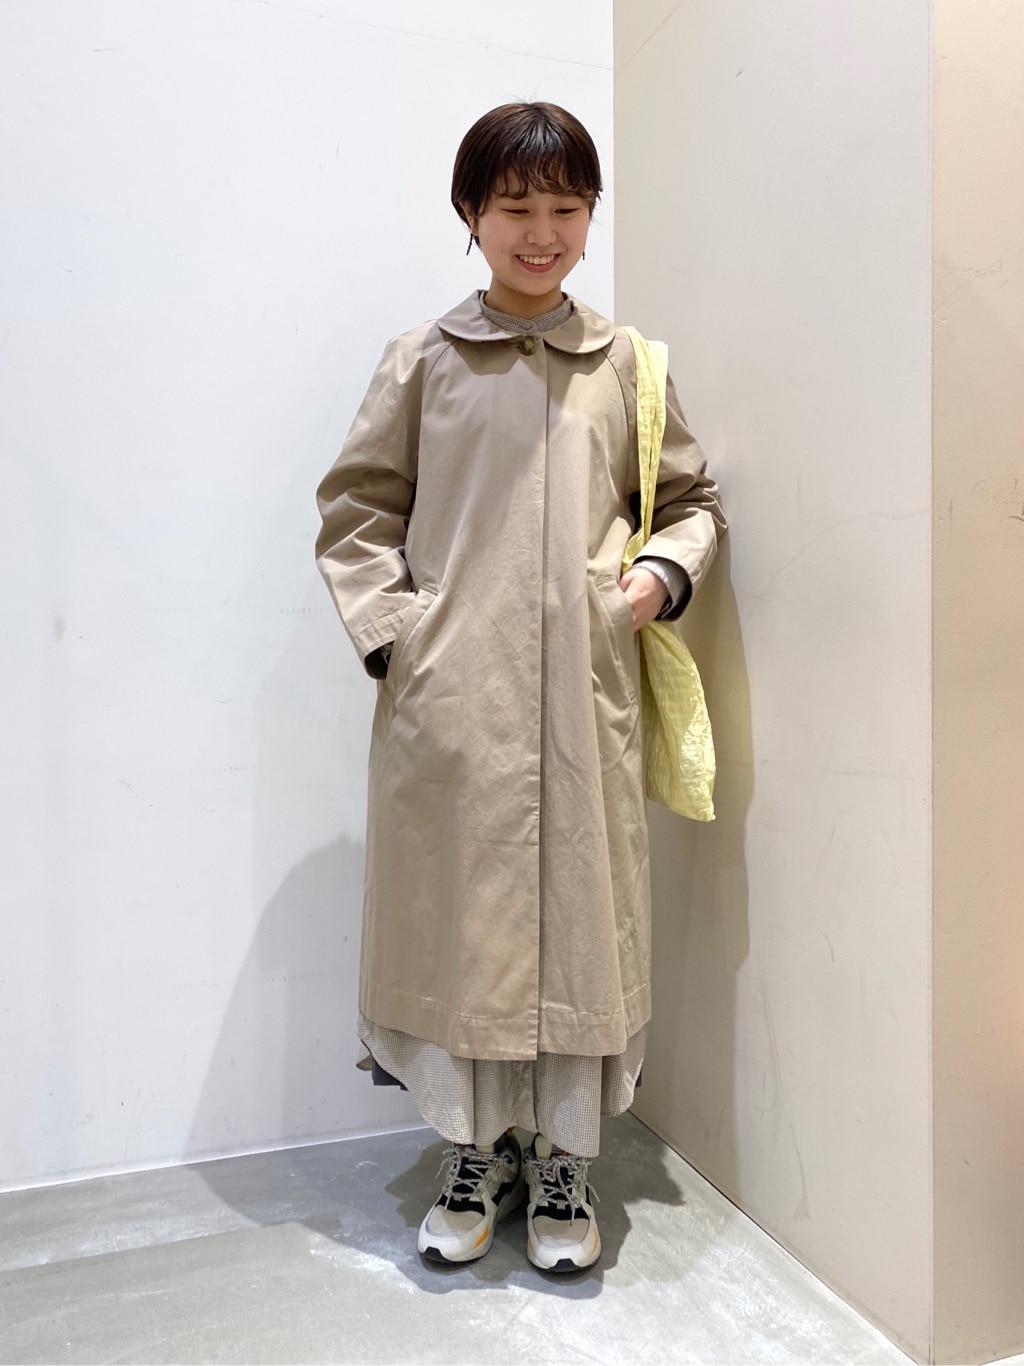 bulle de savon 阪急西宮ガーデンズ 身長:149cm 2021.03.15